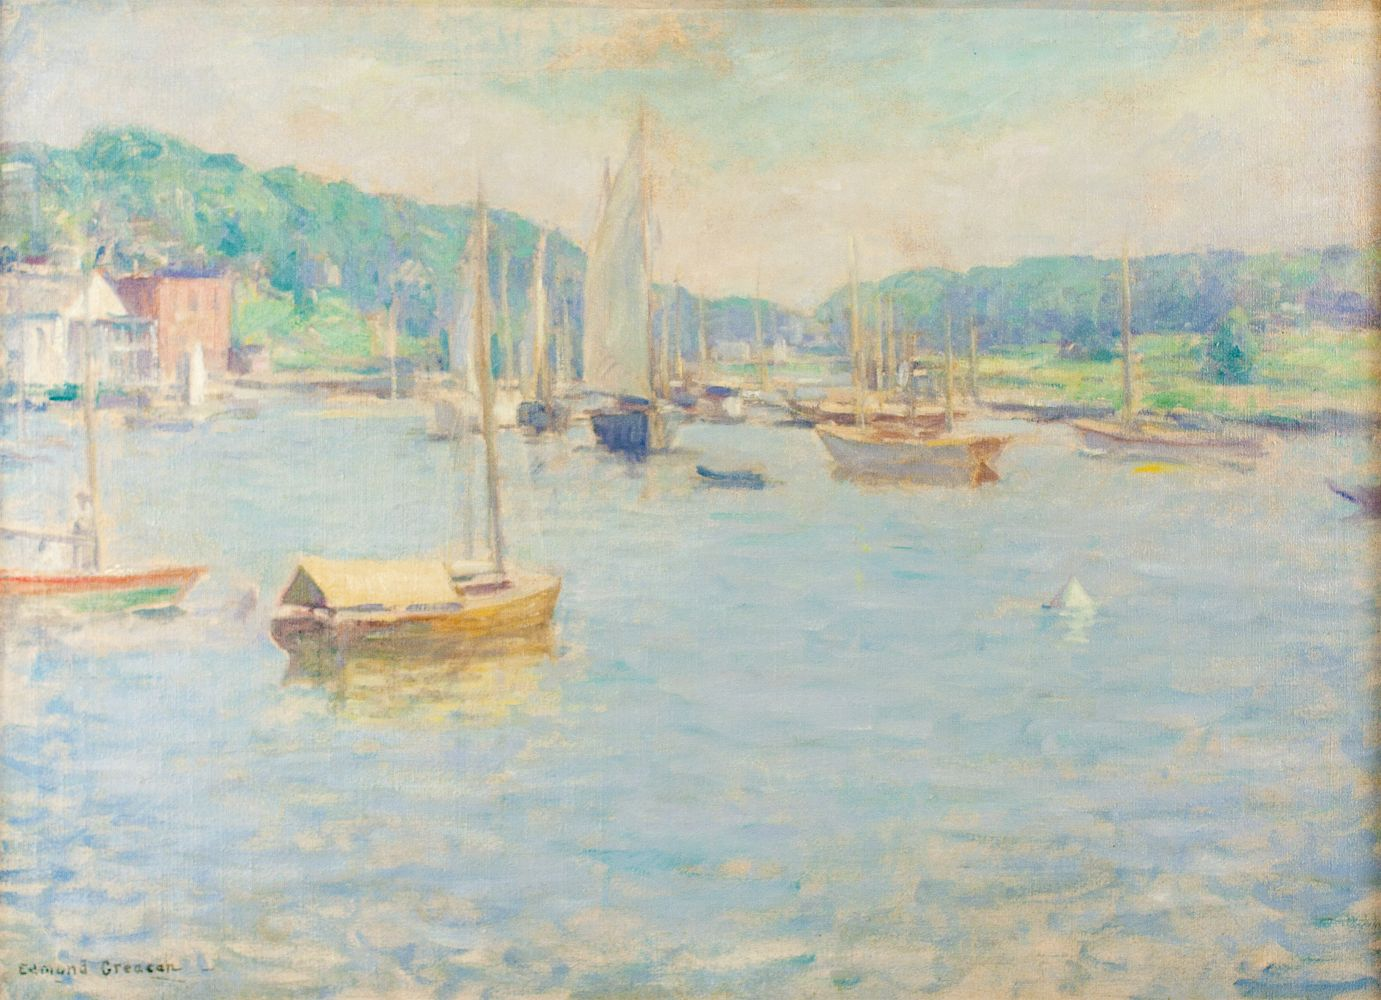 Edmund Greacen (1876–1949), Southport Harbor, c. 1930-33, oil on canvas, 26 1/4 x 36 1/8 in., signed lower left: Edmund Greacen